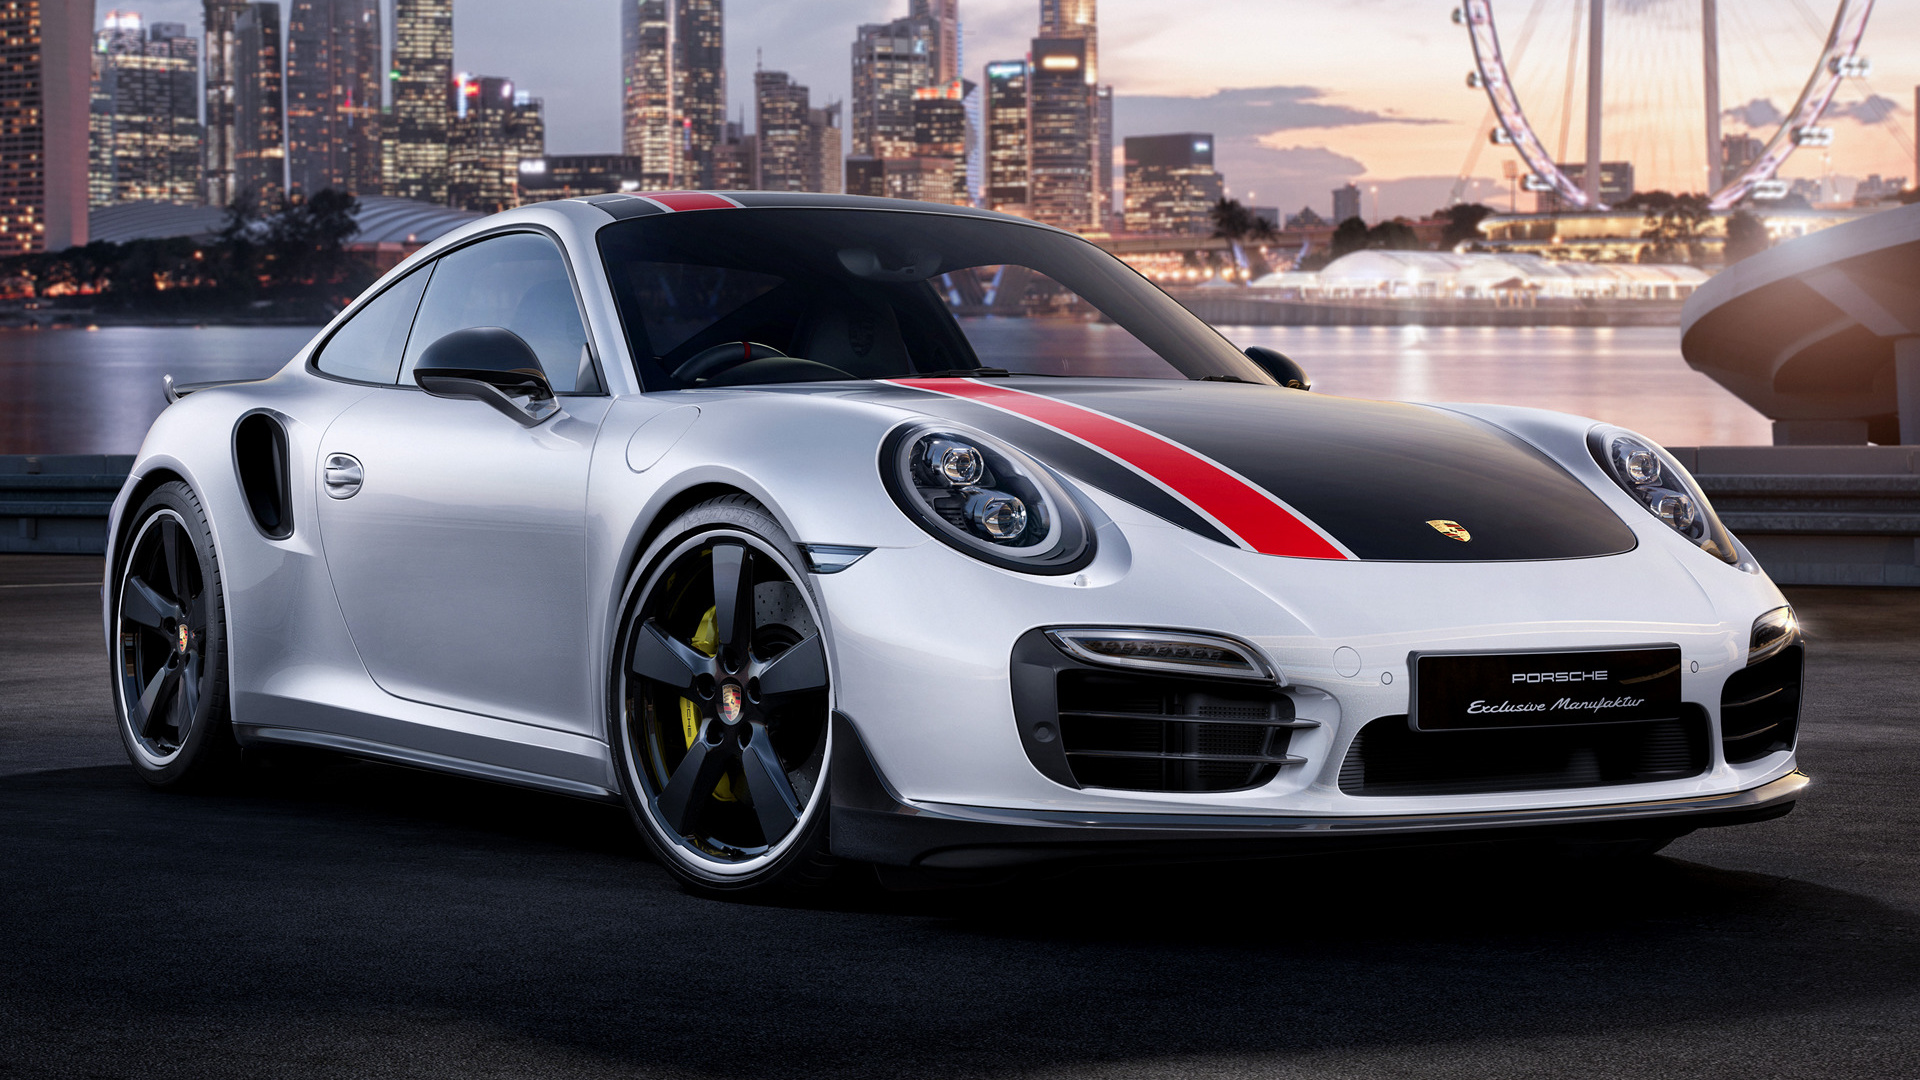 hd 169 wide 85 porsche 911 turbo 2015 techart porsche 911 turbo wallpapers hd - 2015 Porsche 911 Turbo Wallpaper